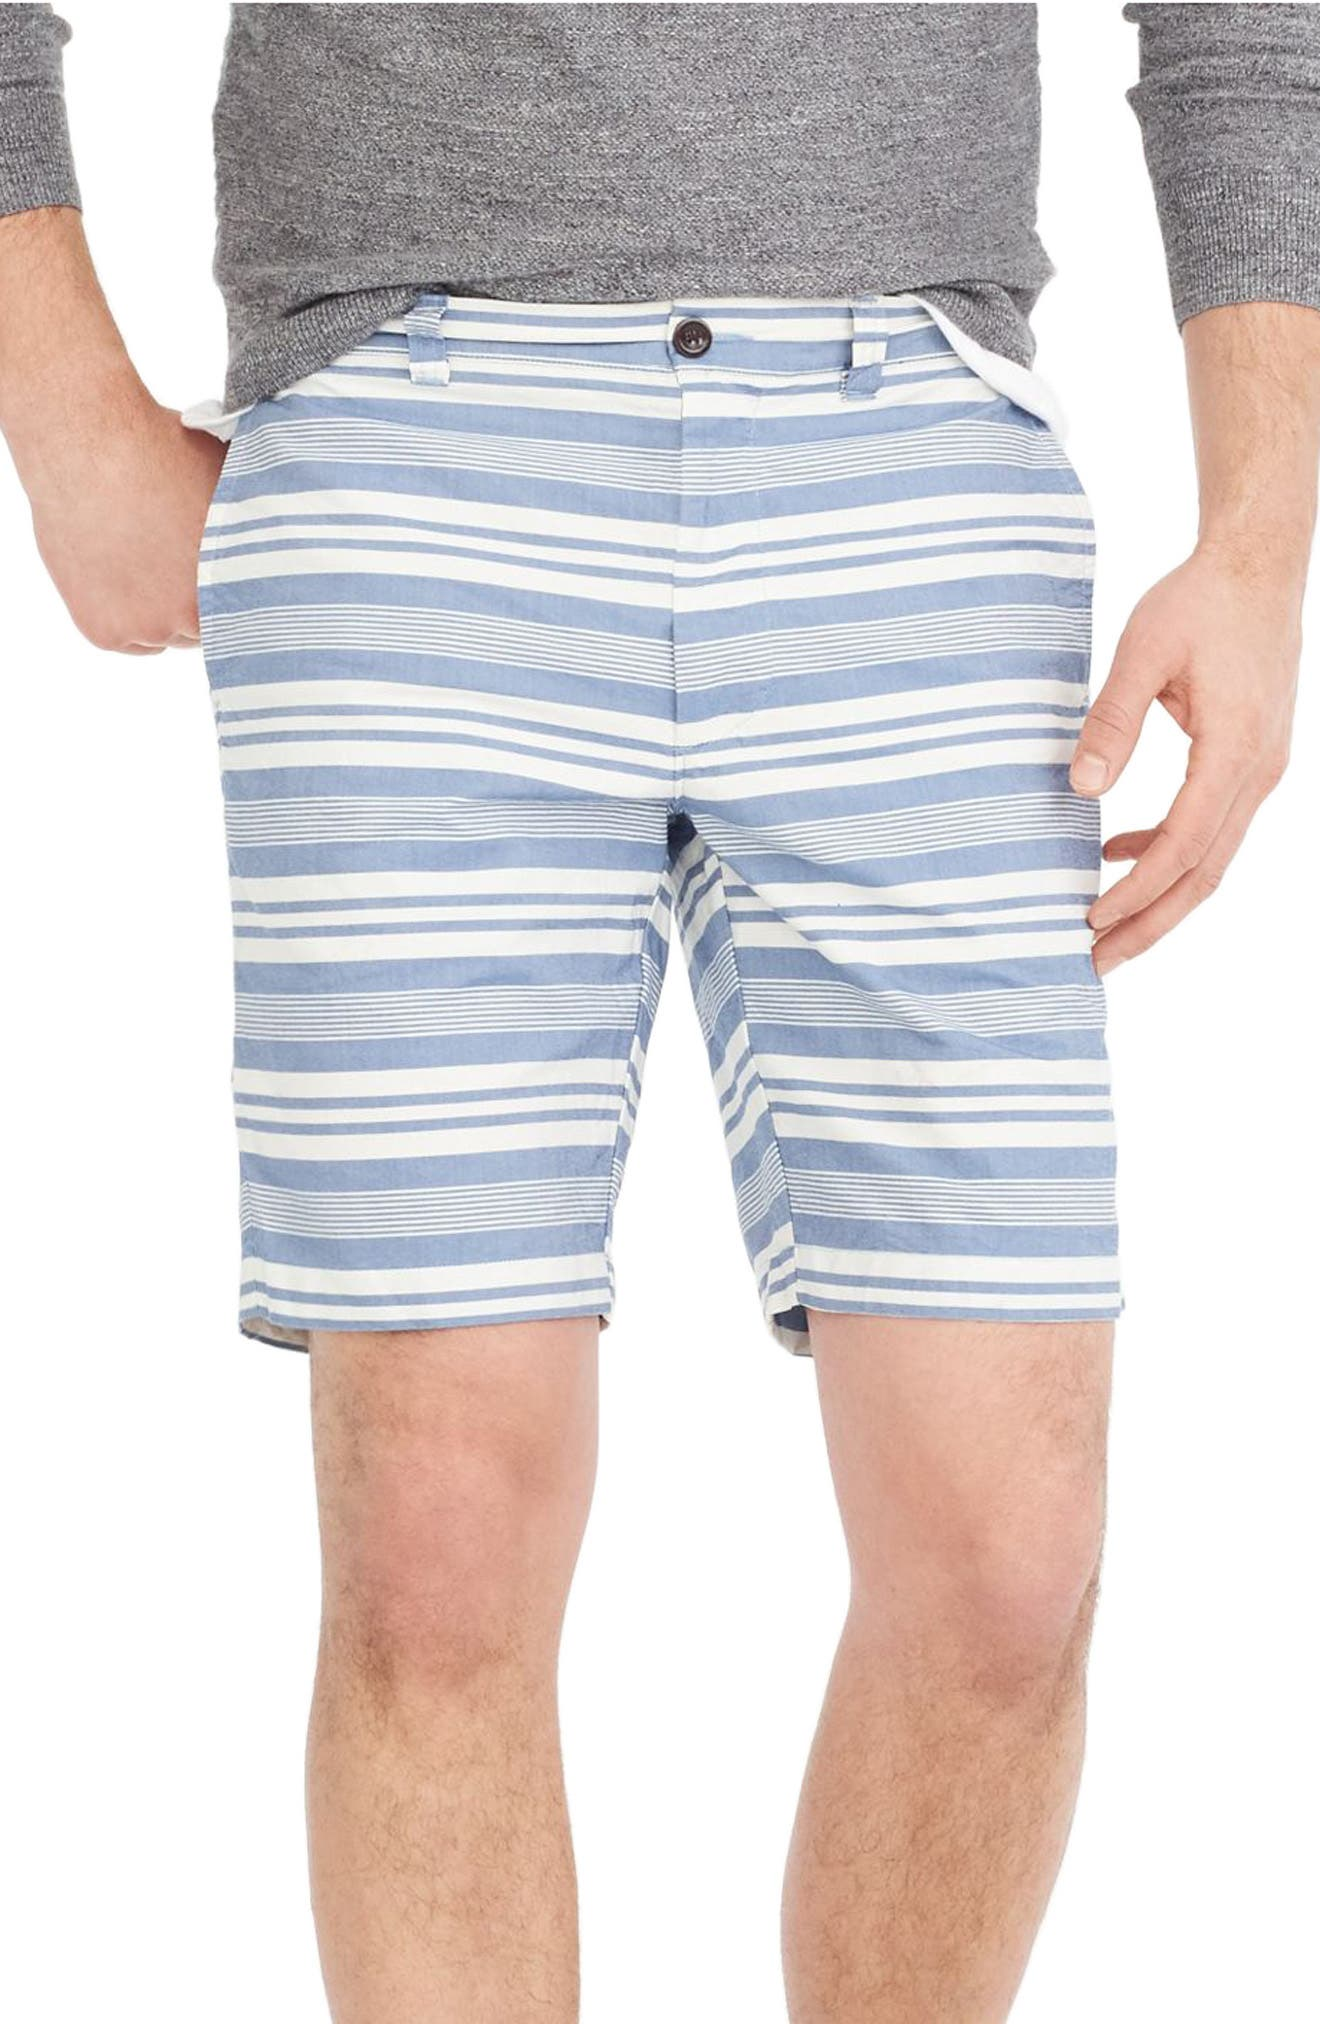 Stripe Oxford Shorts,                         Main,                         color, White/ Blue